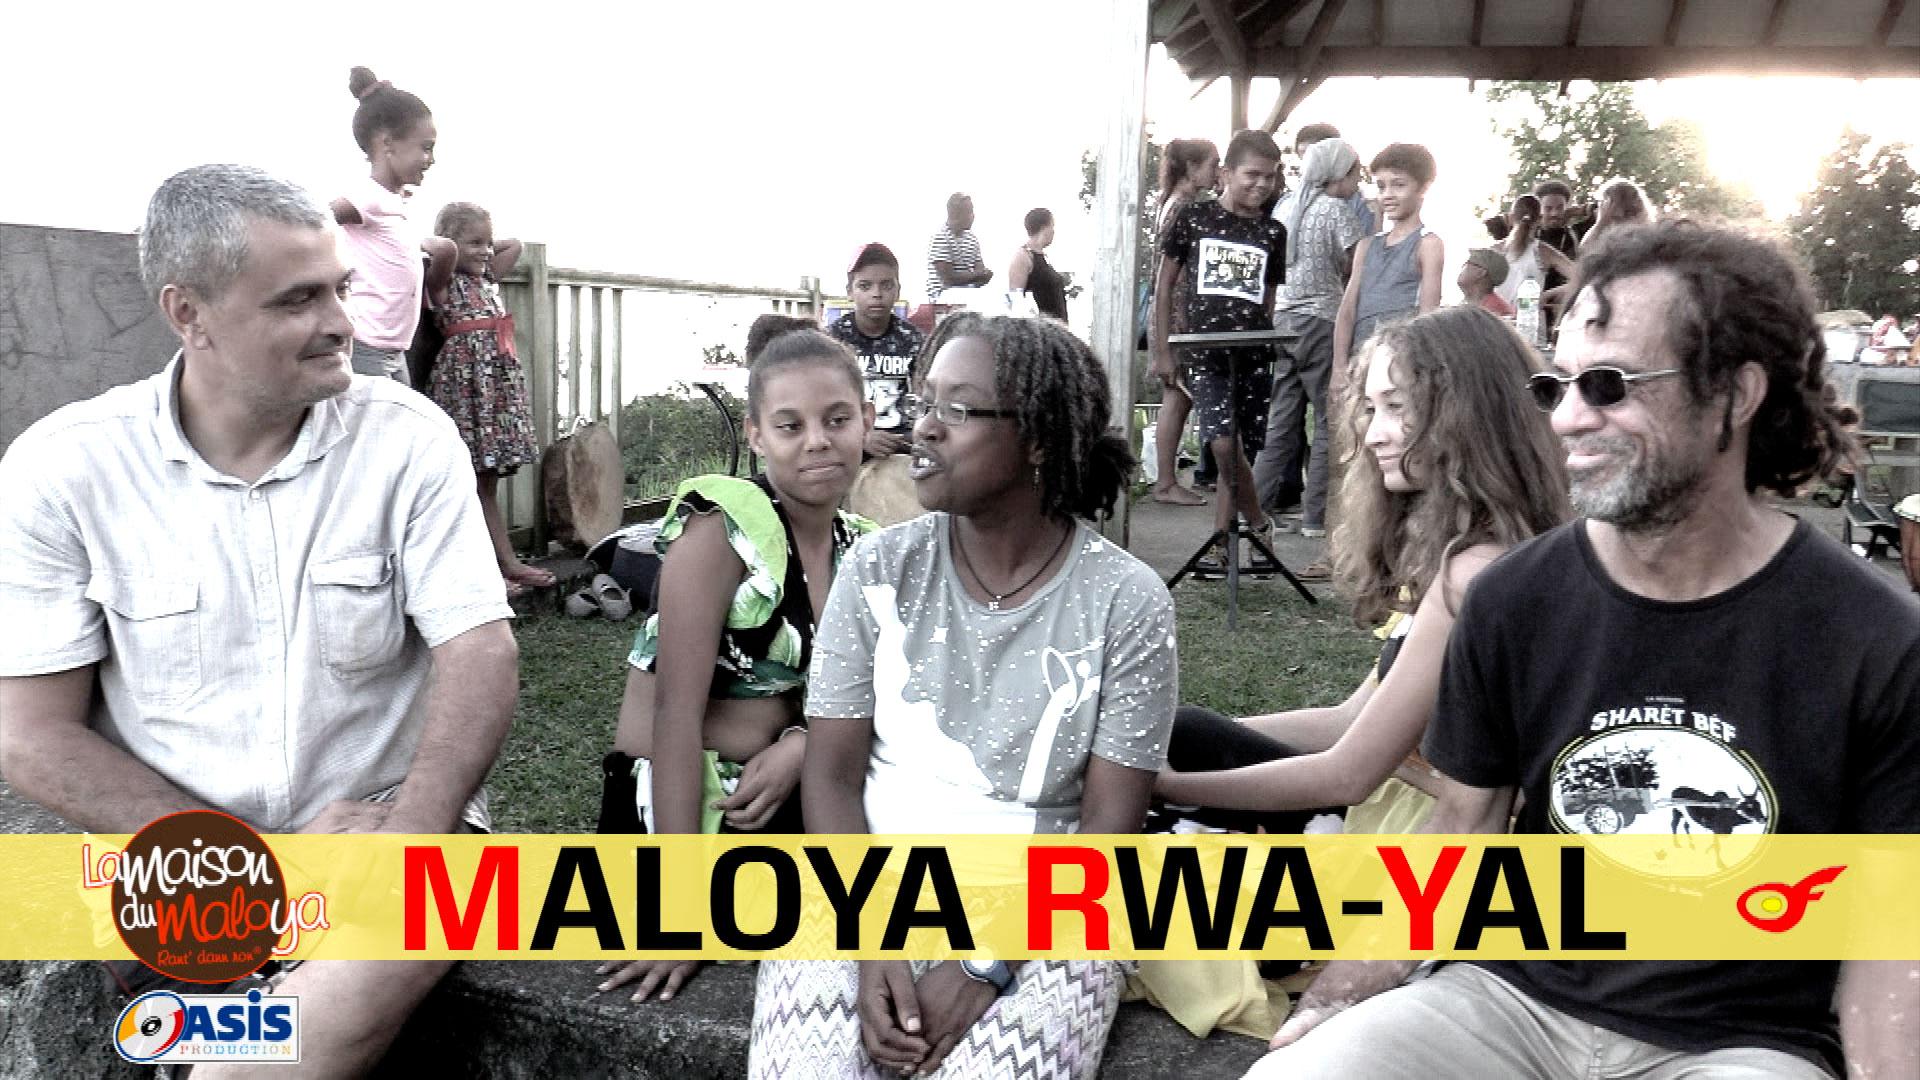 MALOYA RWA YAL